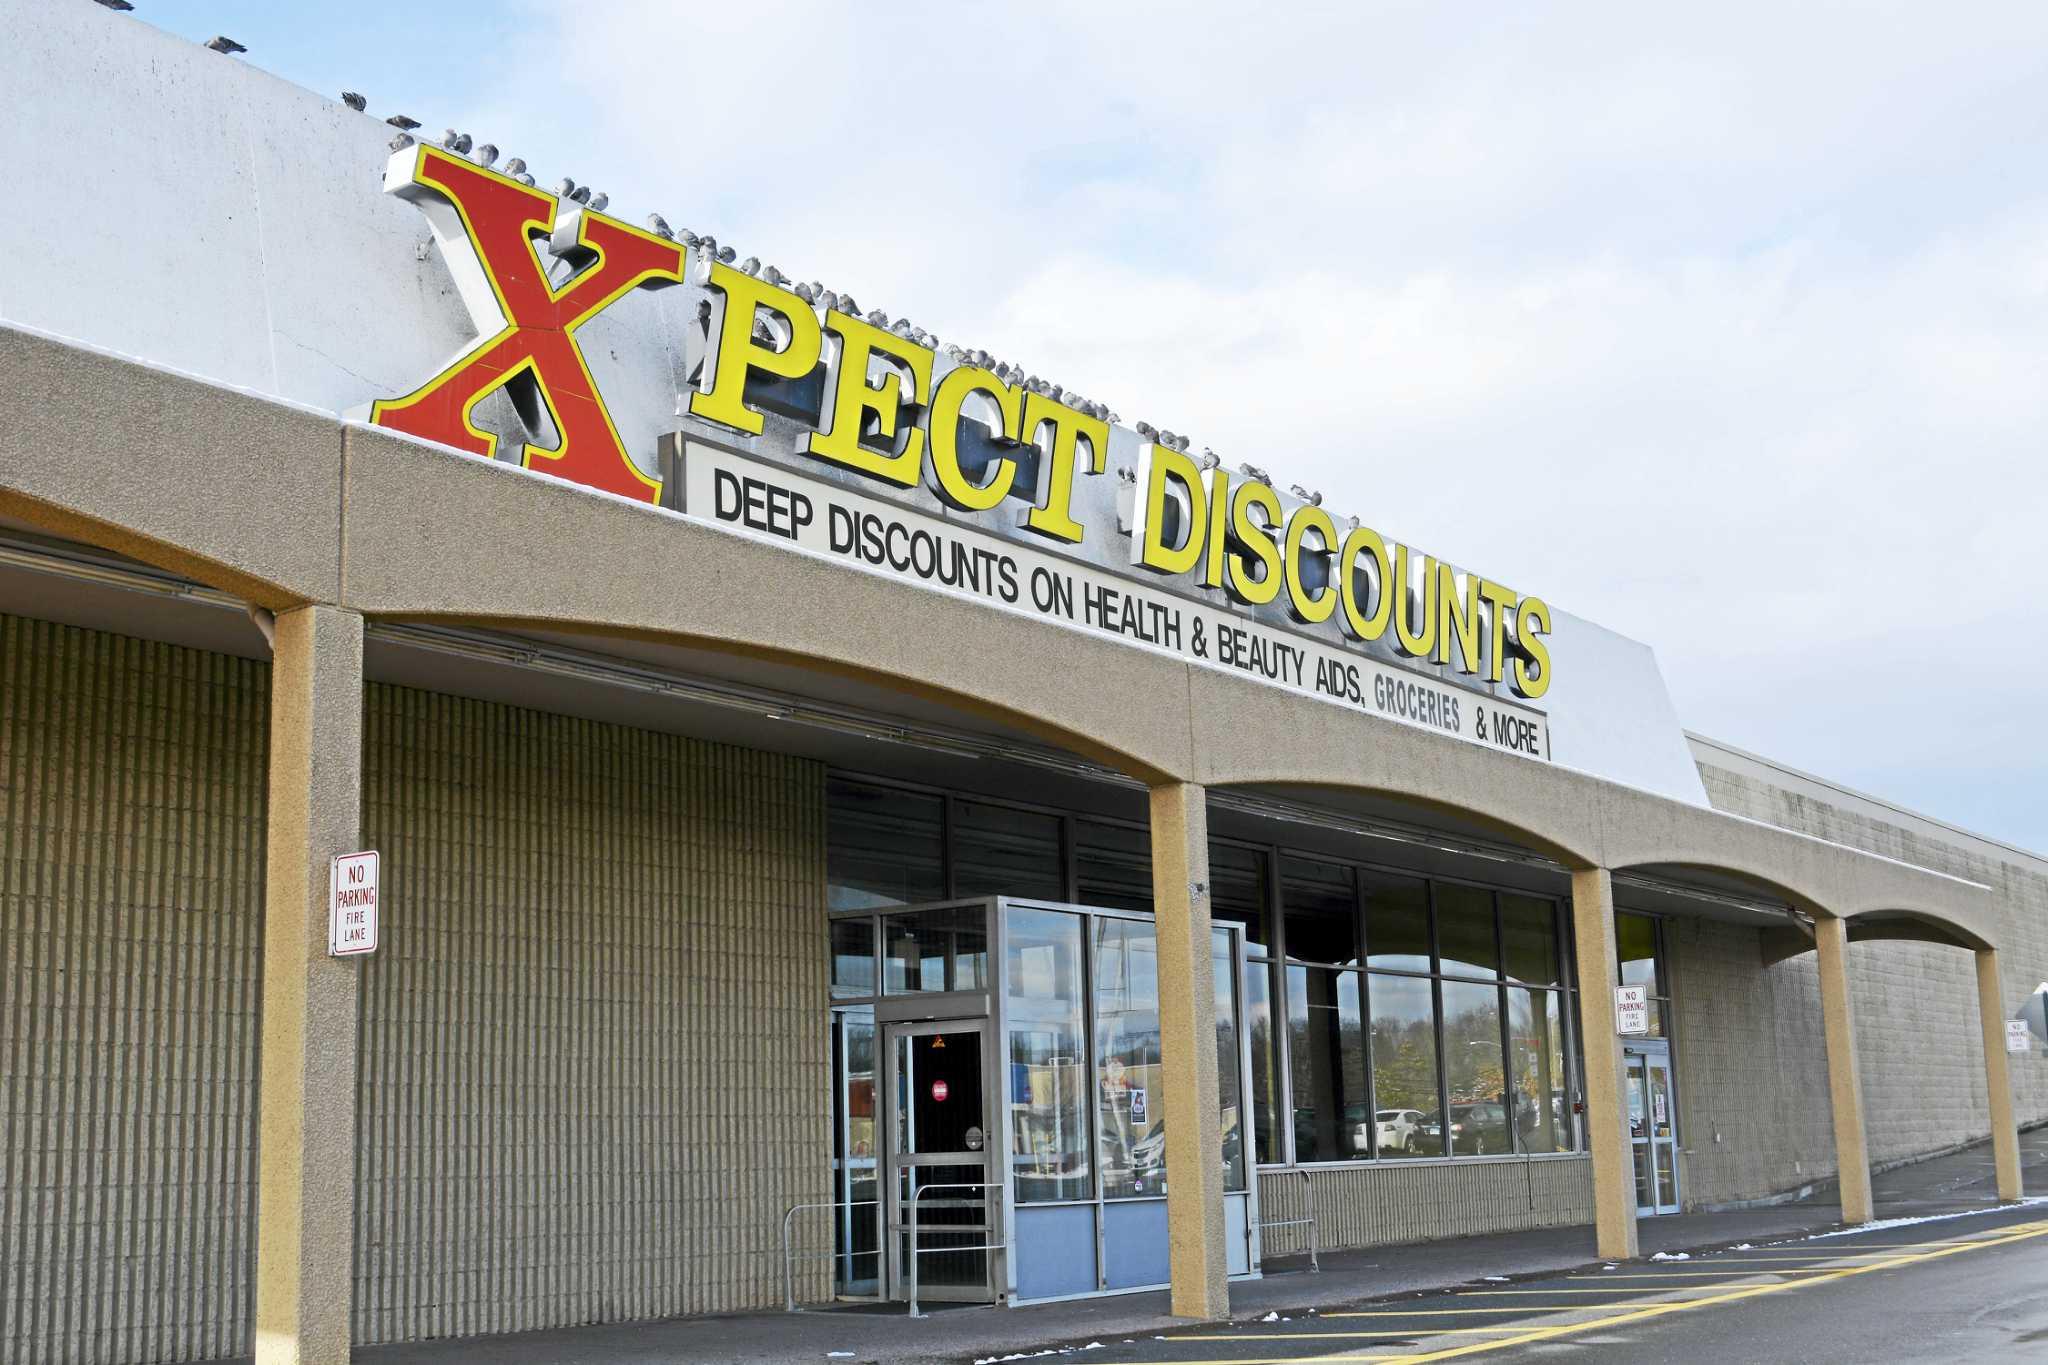 Kmart Hours Is it Open Today?